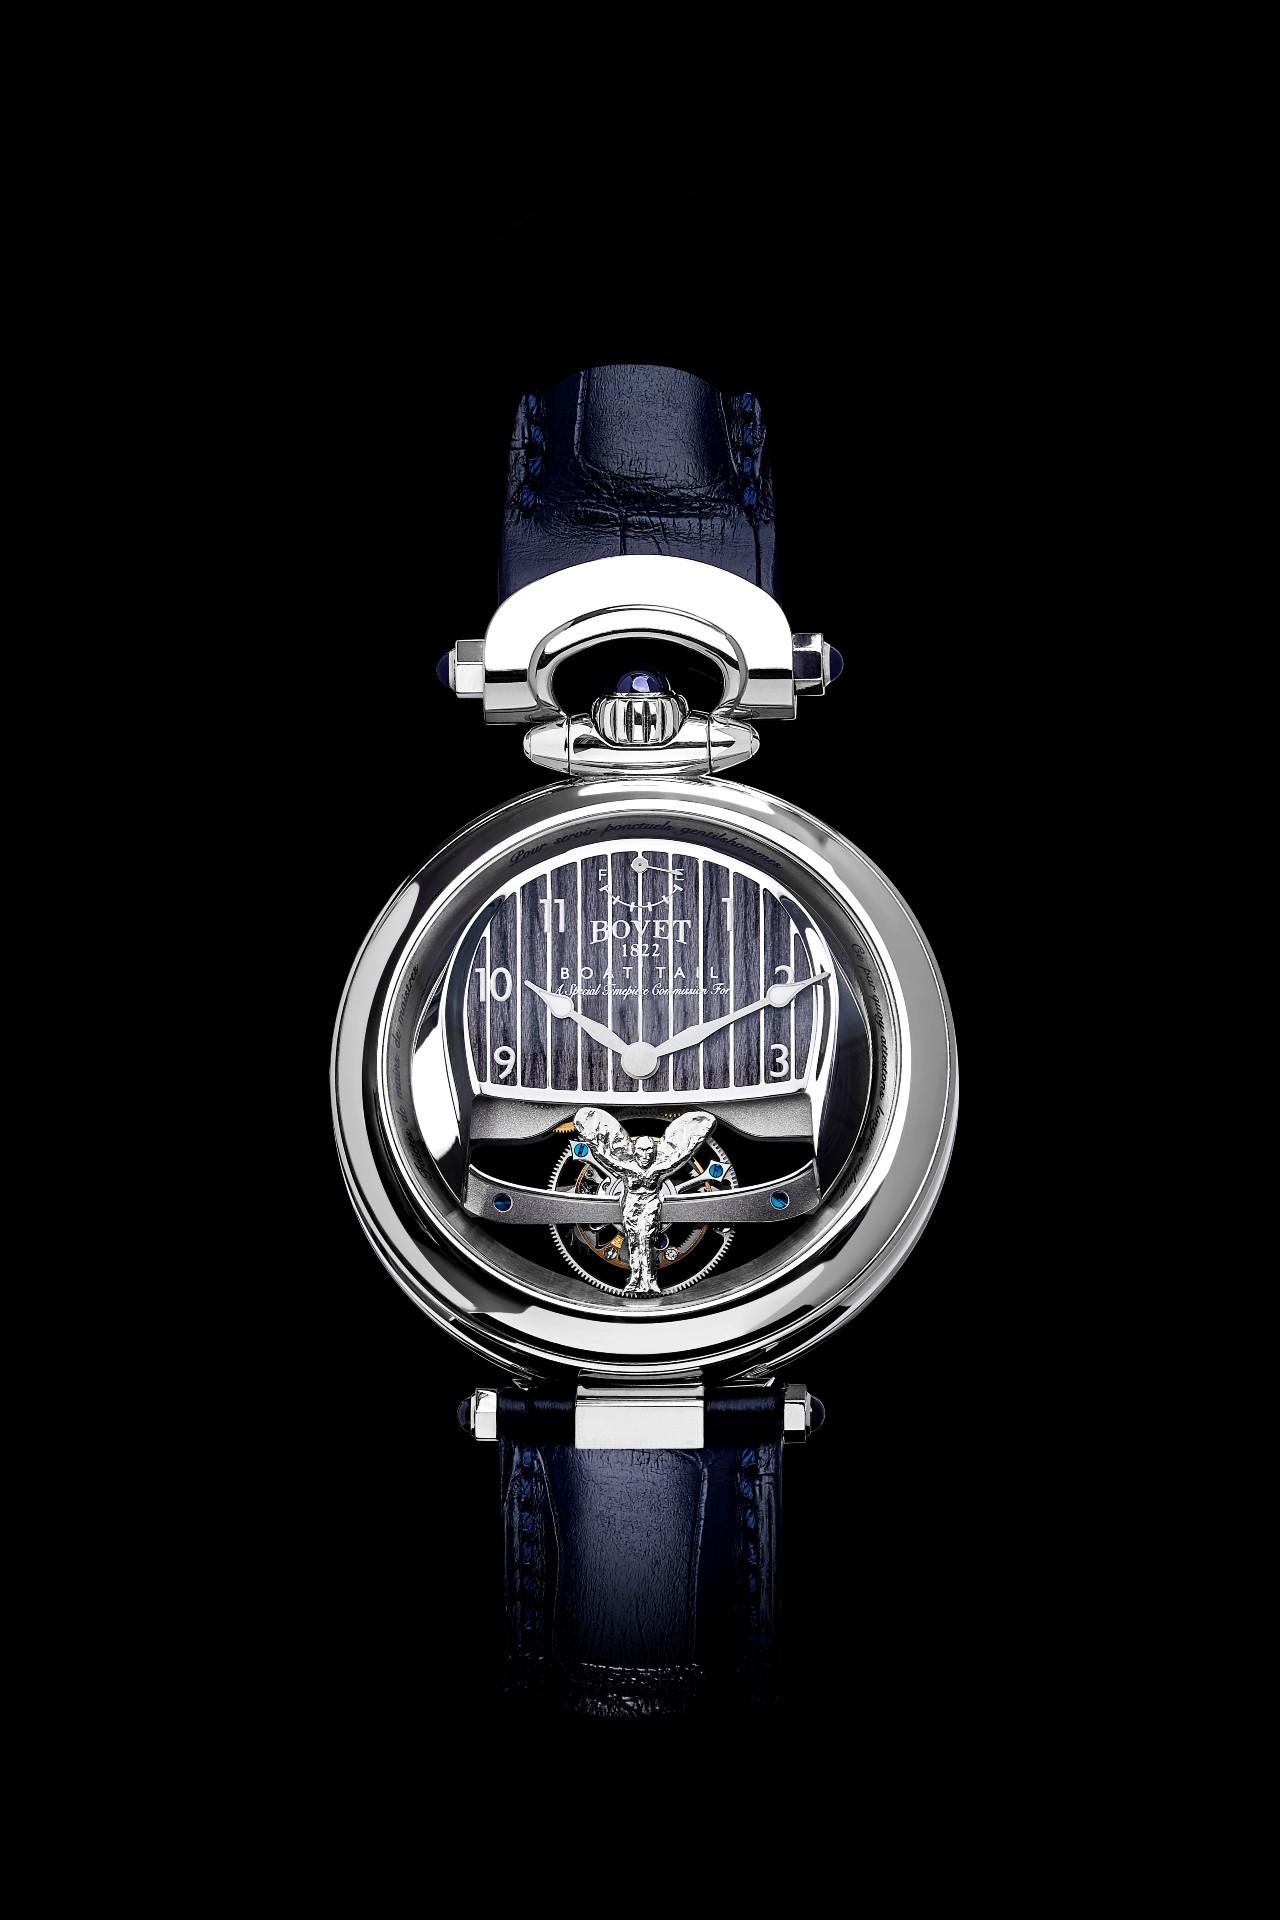 Bespoke timepiece 1 face I